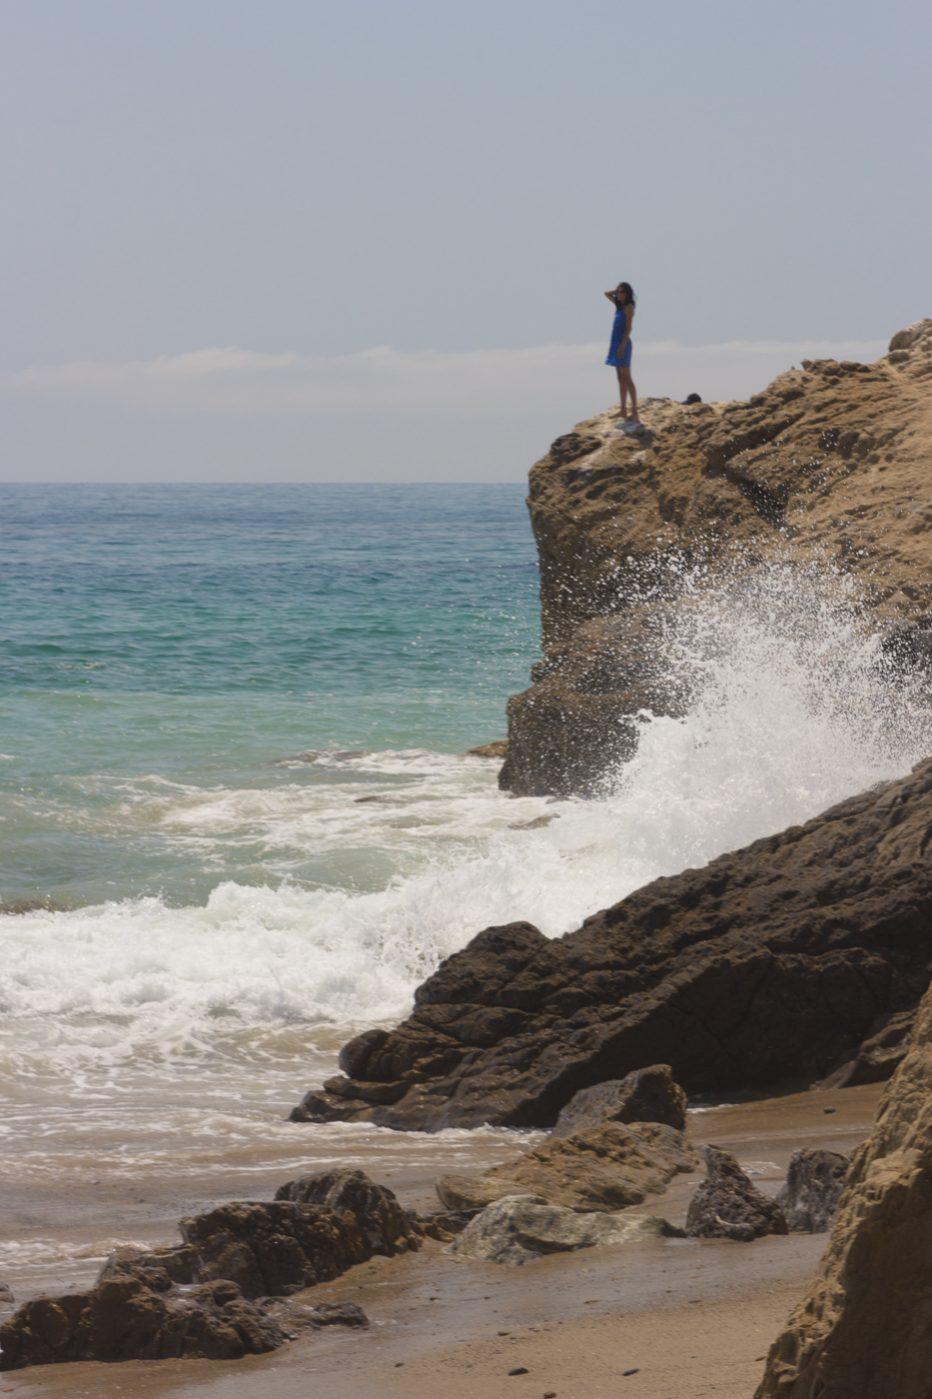 Malibu surroundings, girl looking over the water with wave crashing